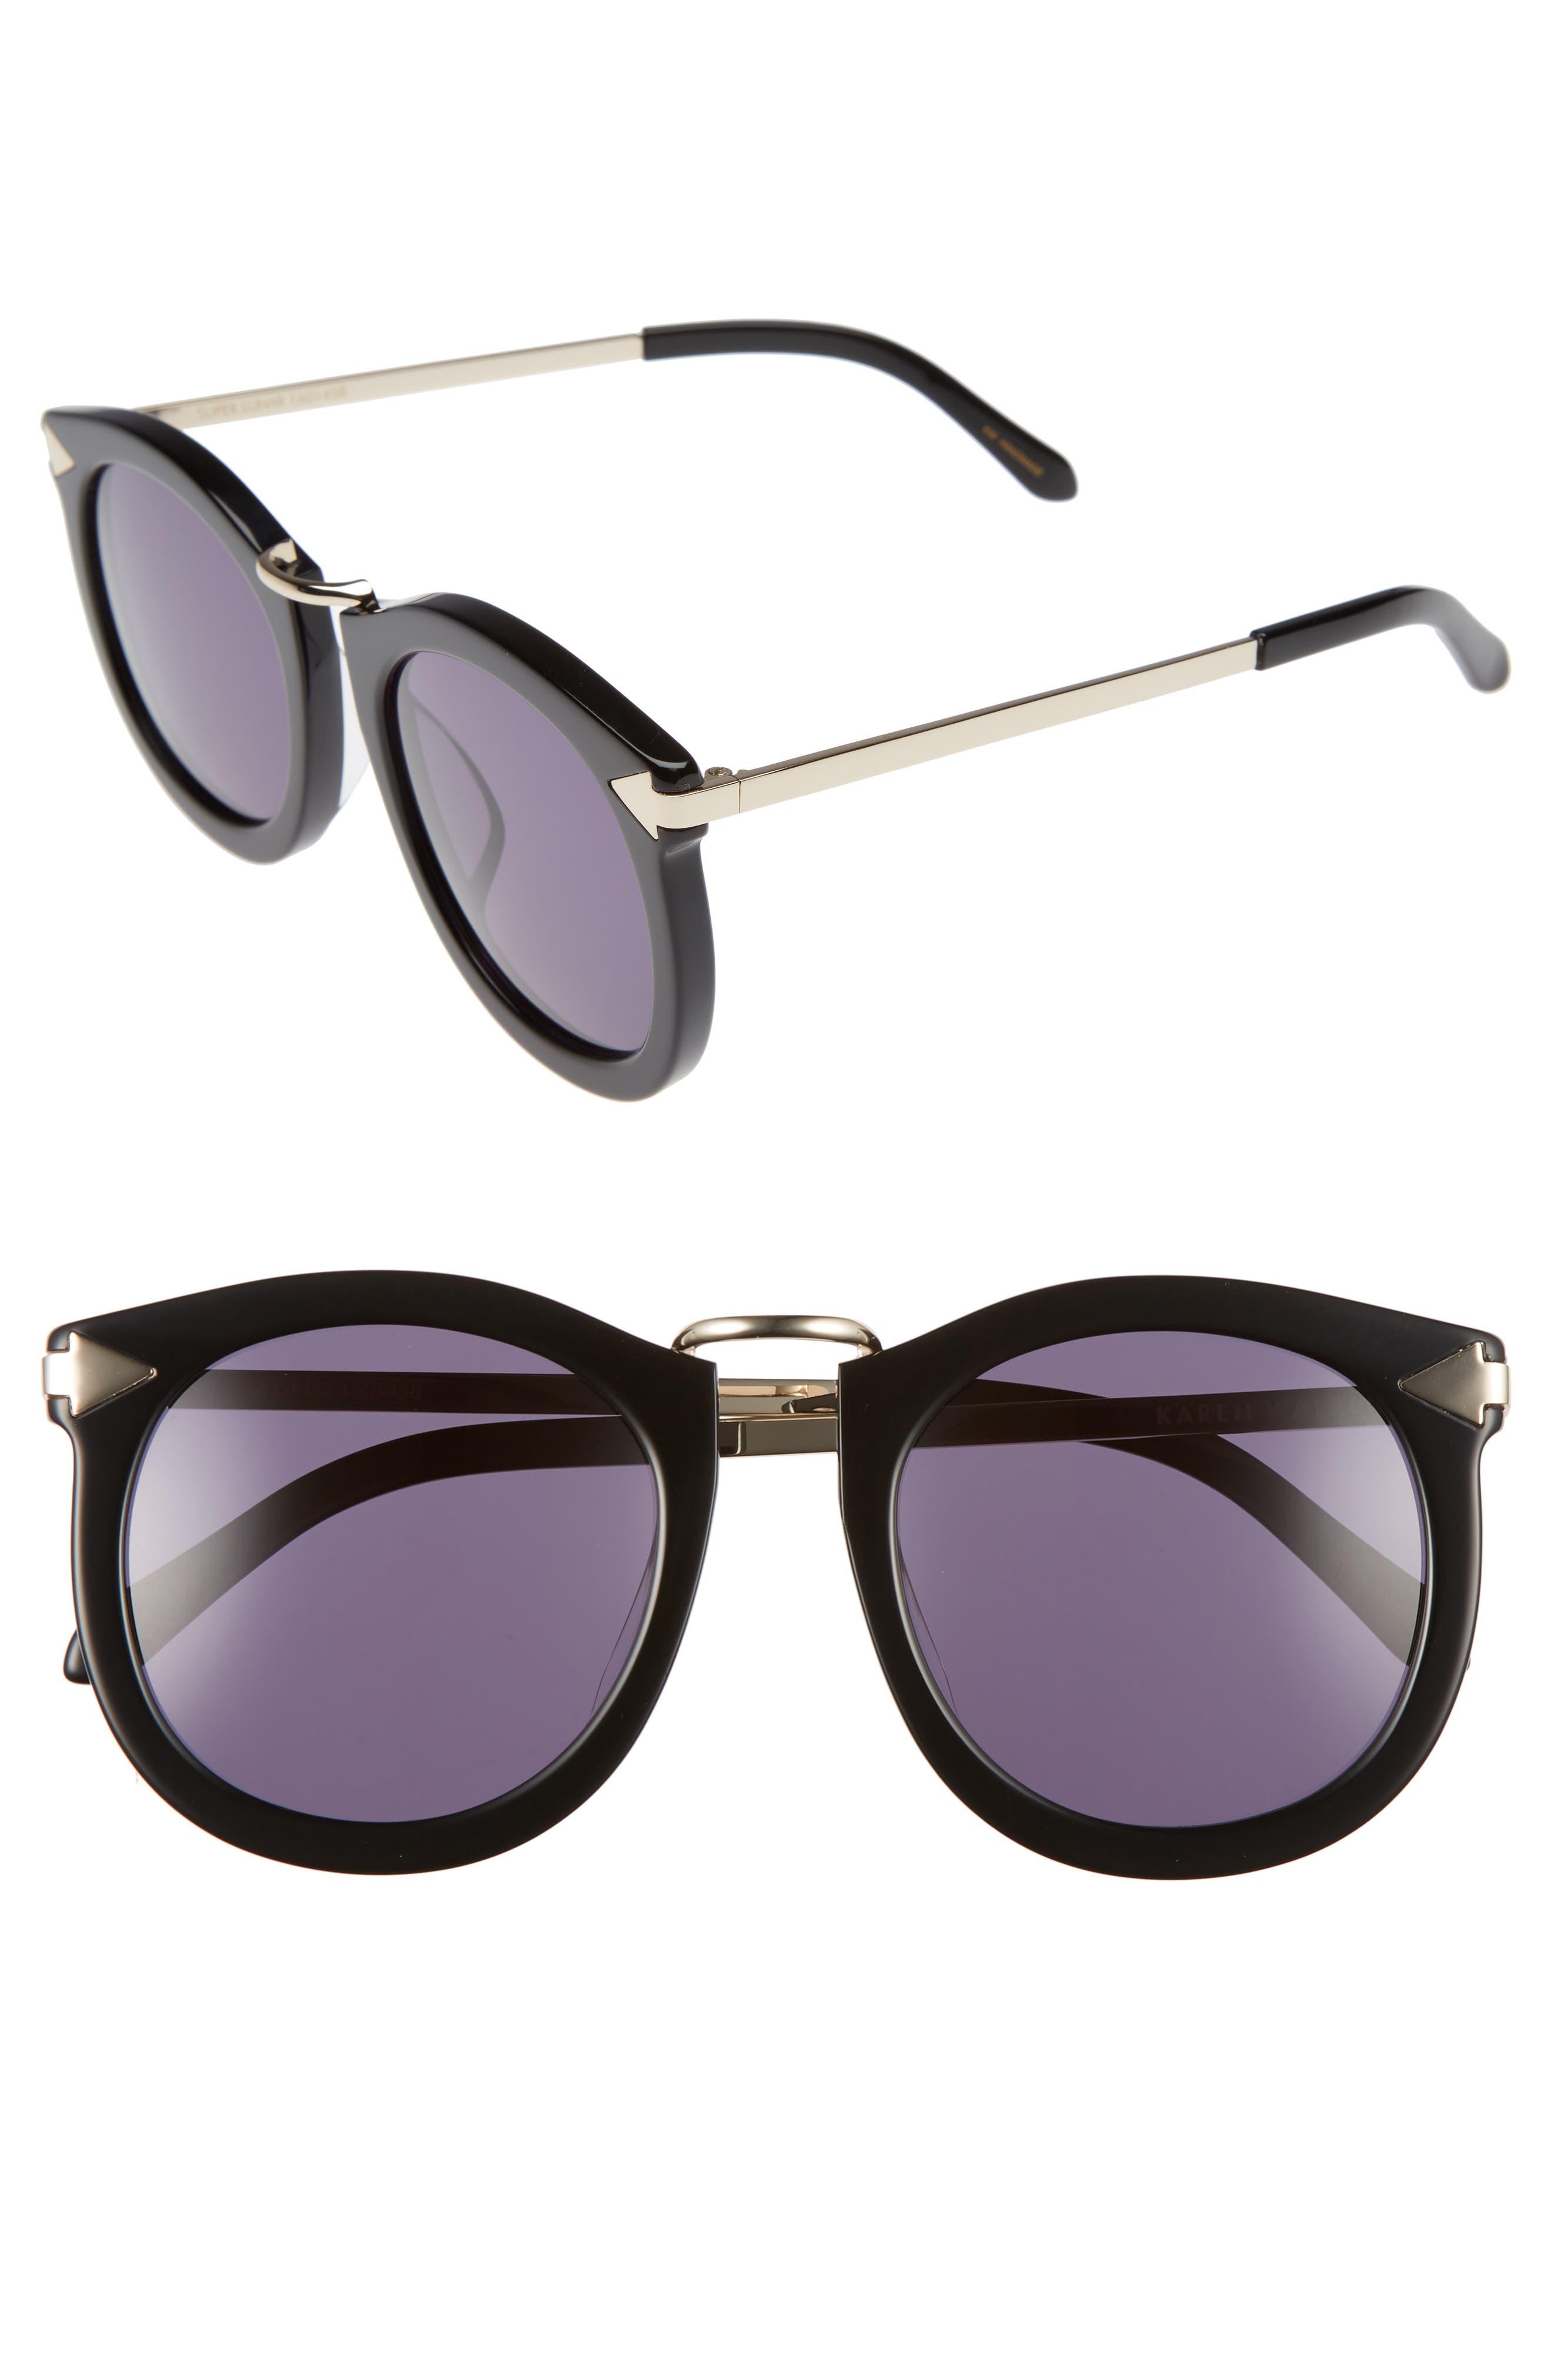 Alternative Fit Super Lunar - Arrowed by Karen 50mm Sunglasses,                         Main,                         color, 001